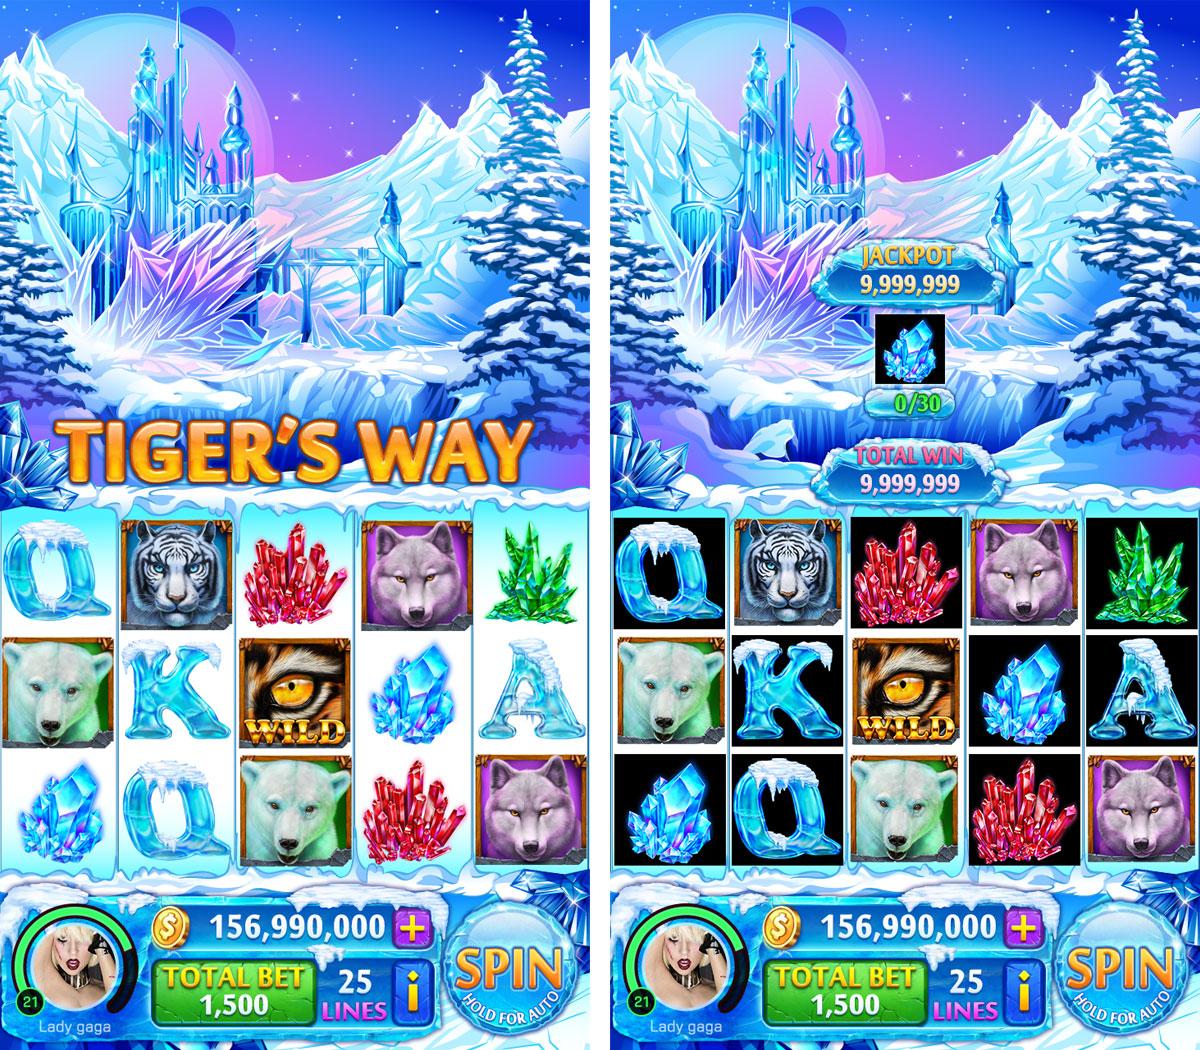 tigers_way_blog_reels